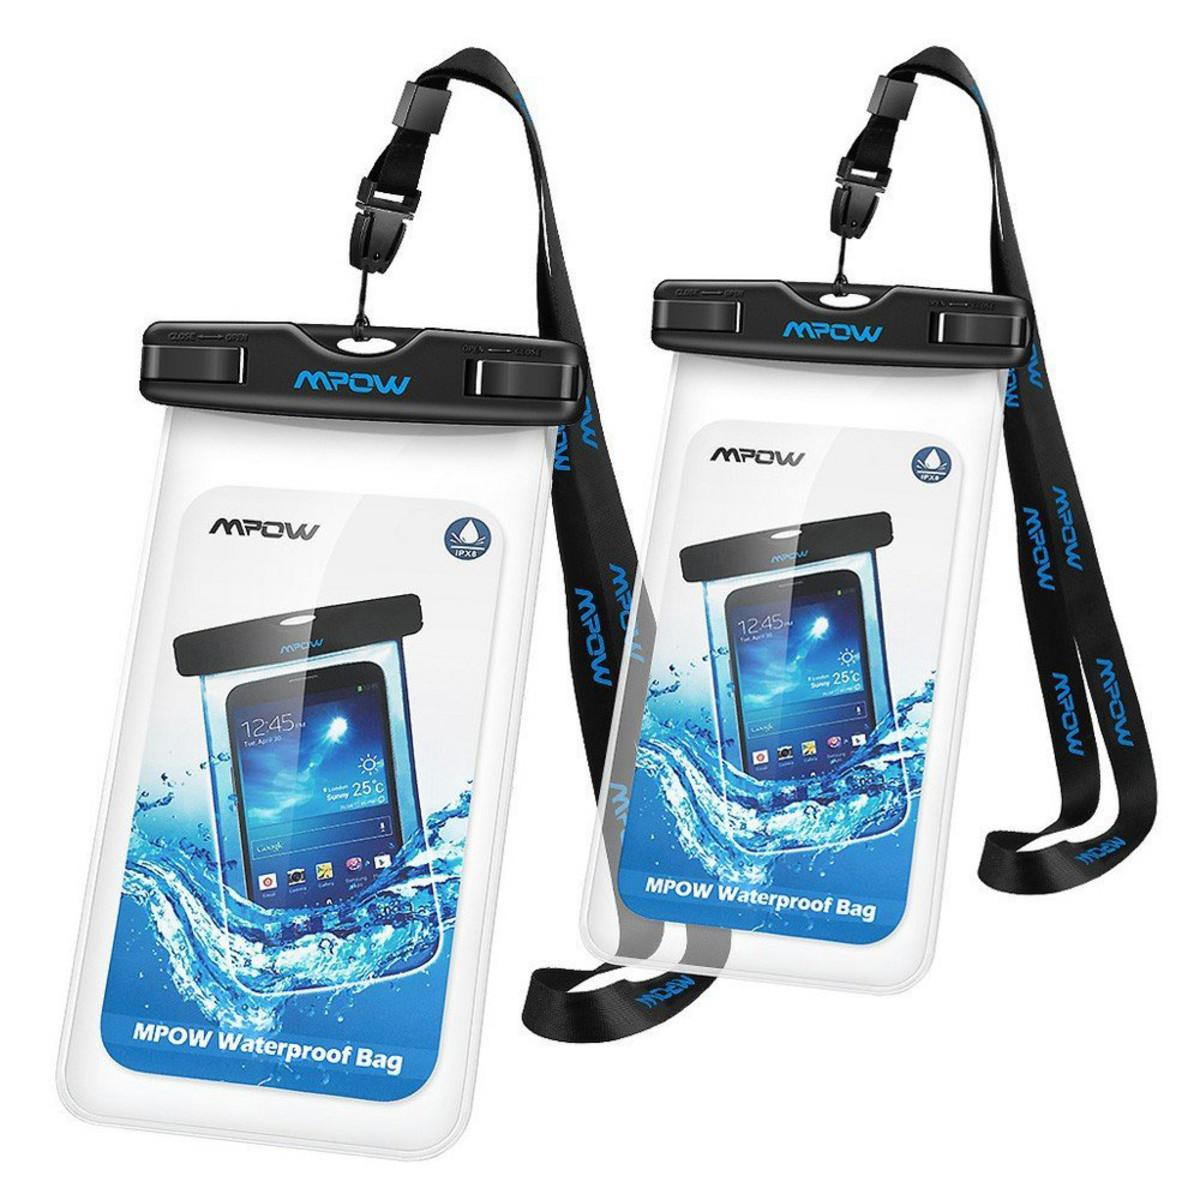 waterproof-case.jpg